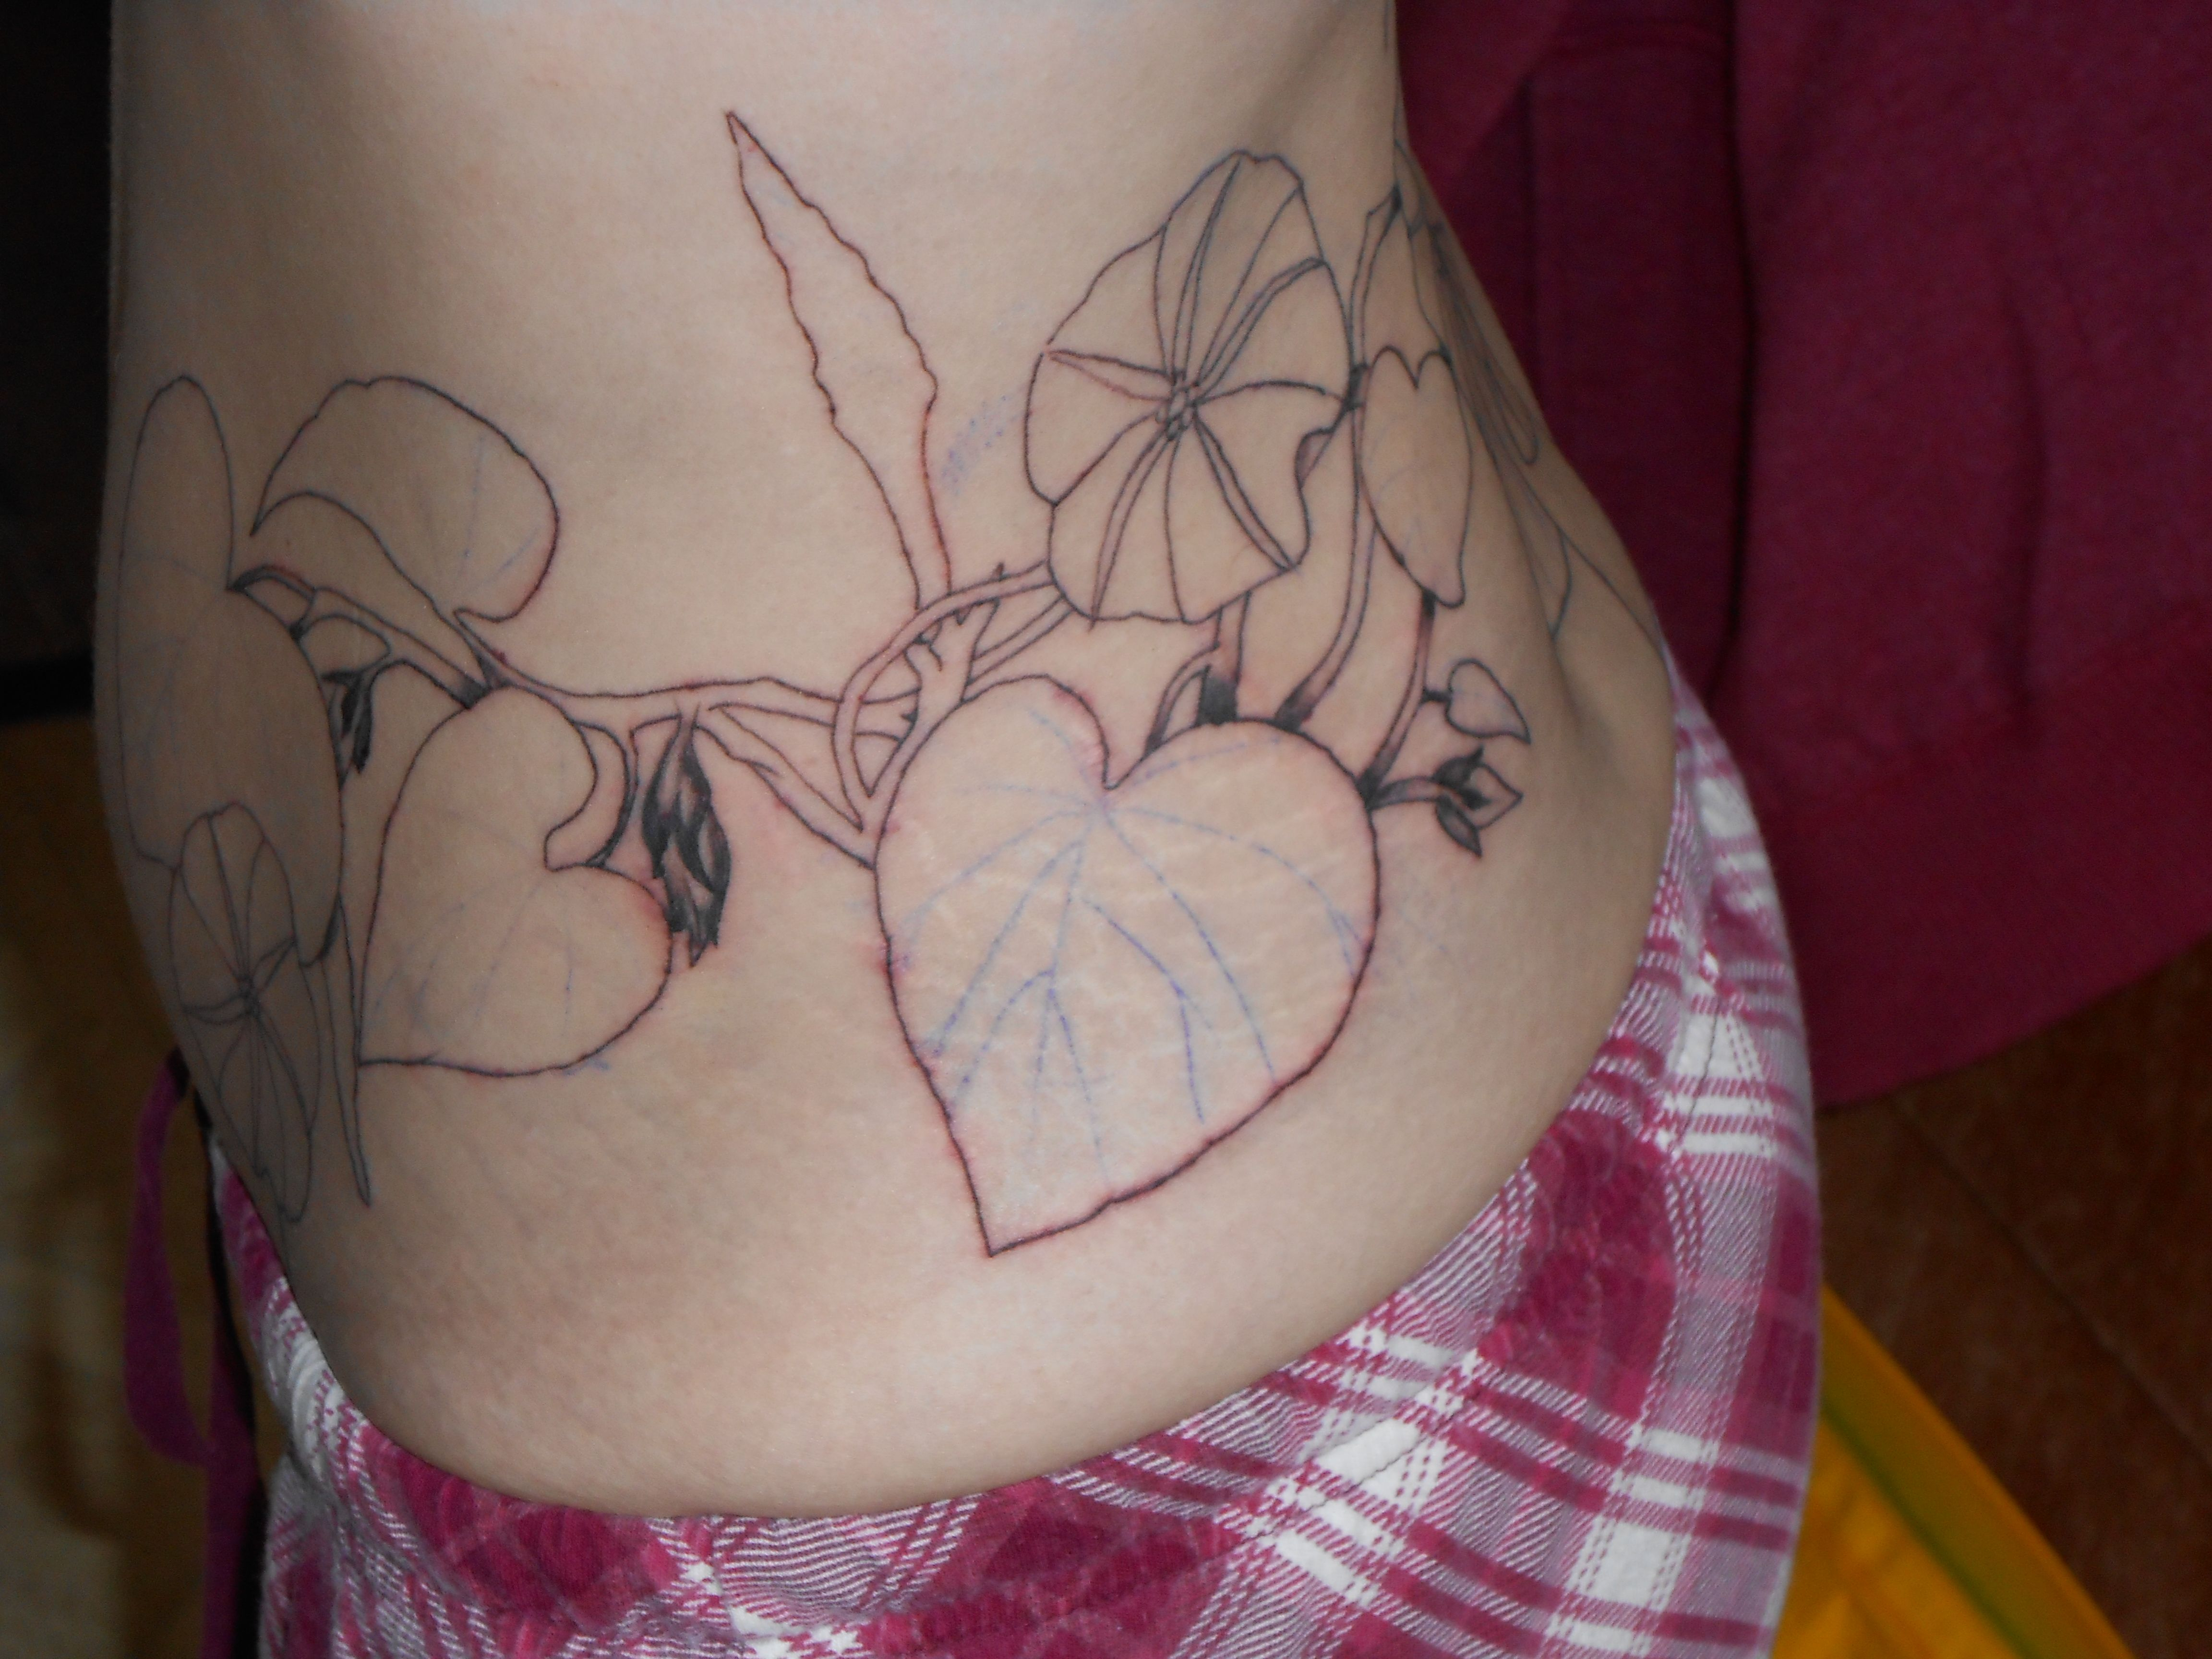 I guess it's a lower back, side, hip, inner pelvis tattoo